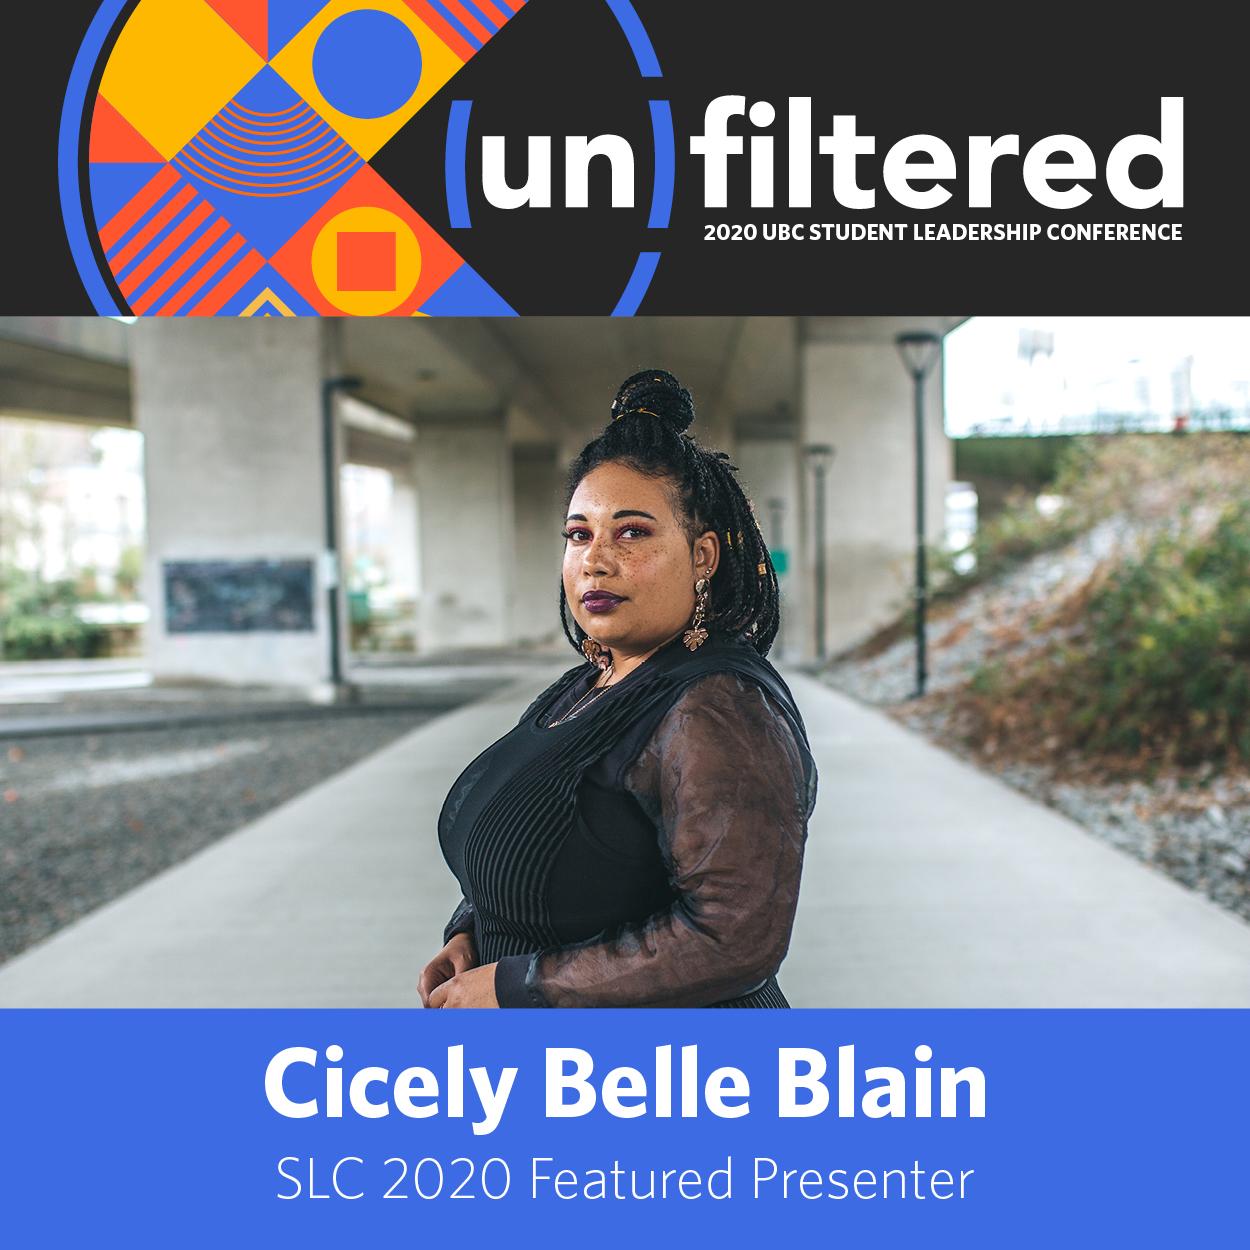 SLC 2020 Featured Presenter Cicely Belle Blain